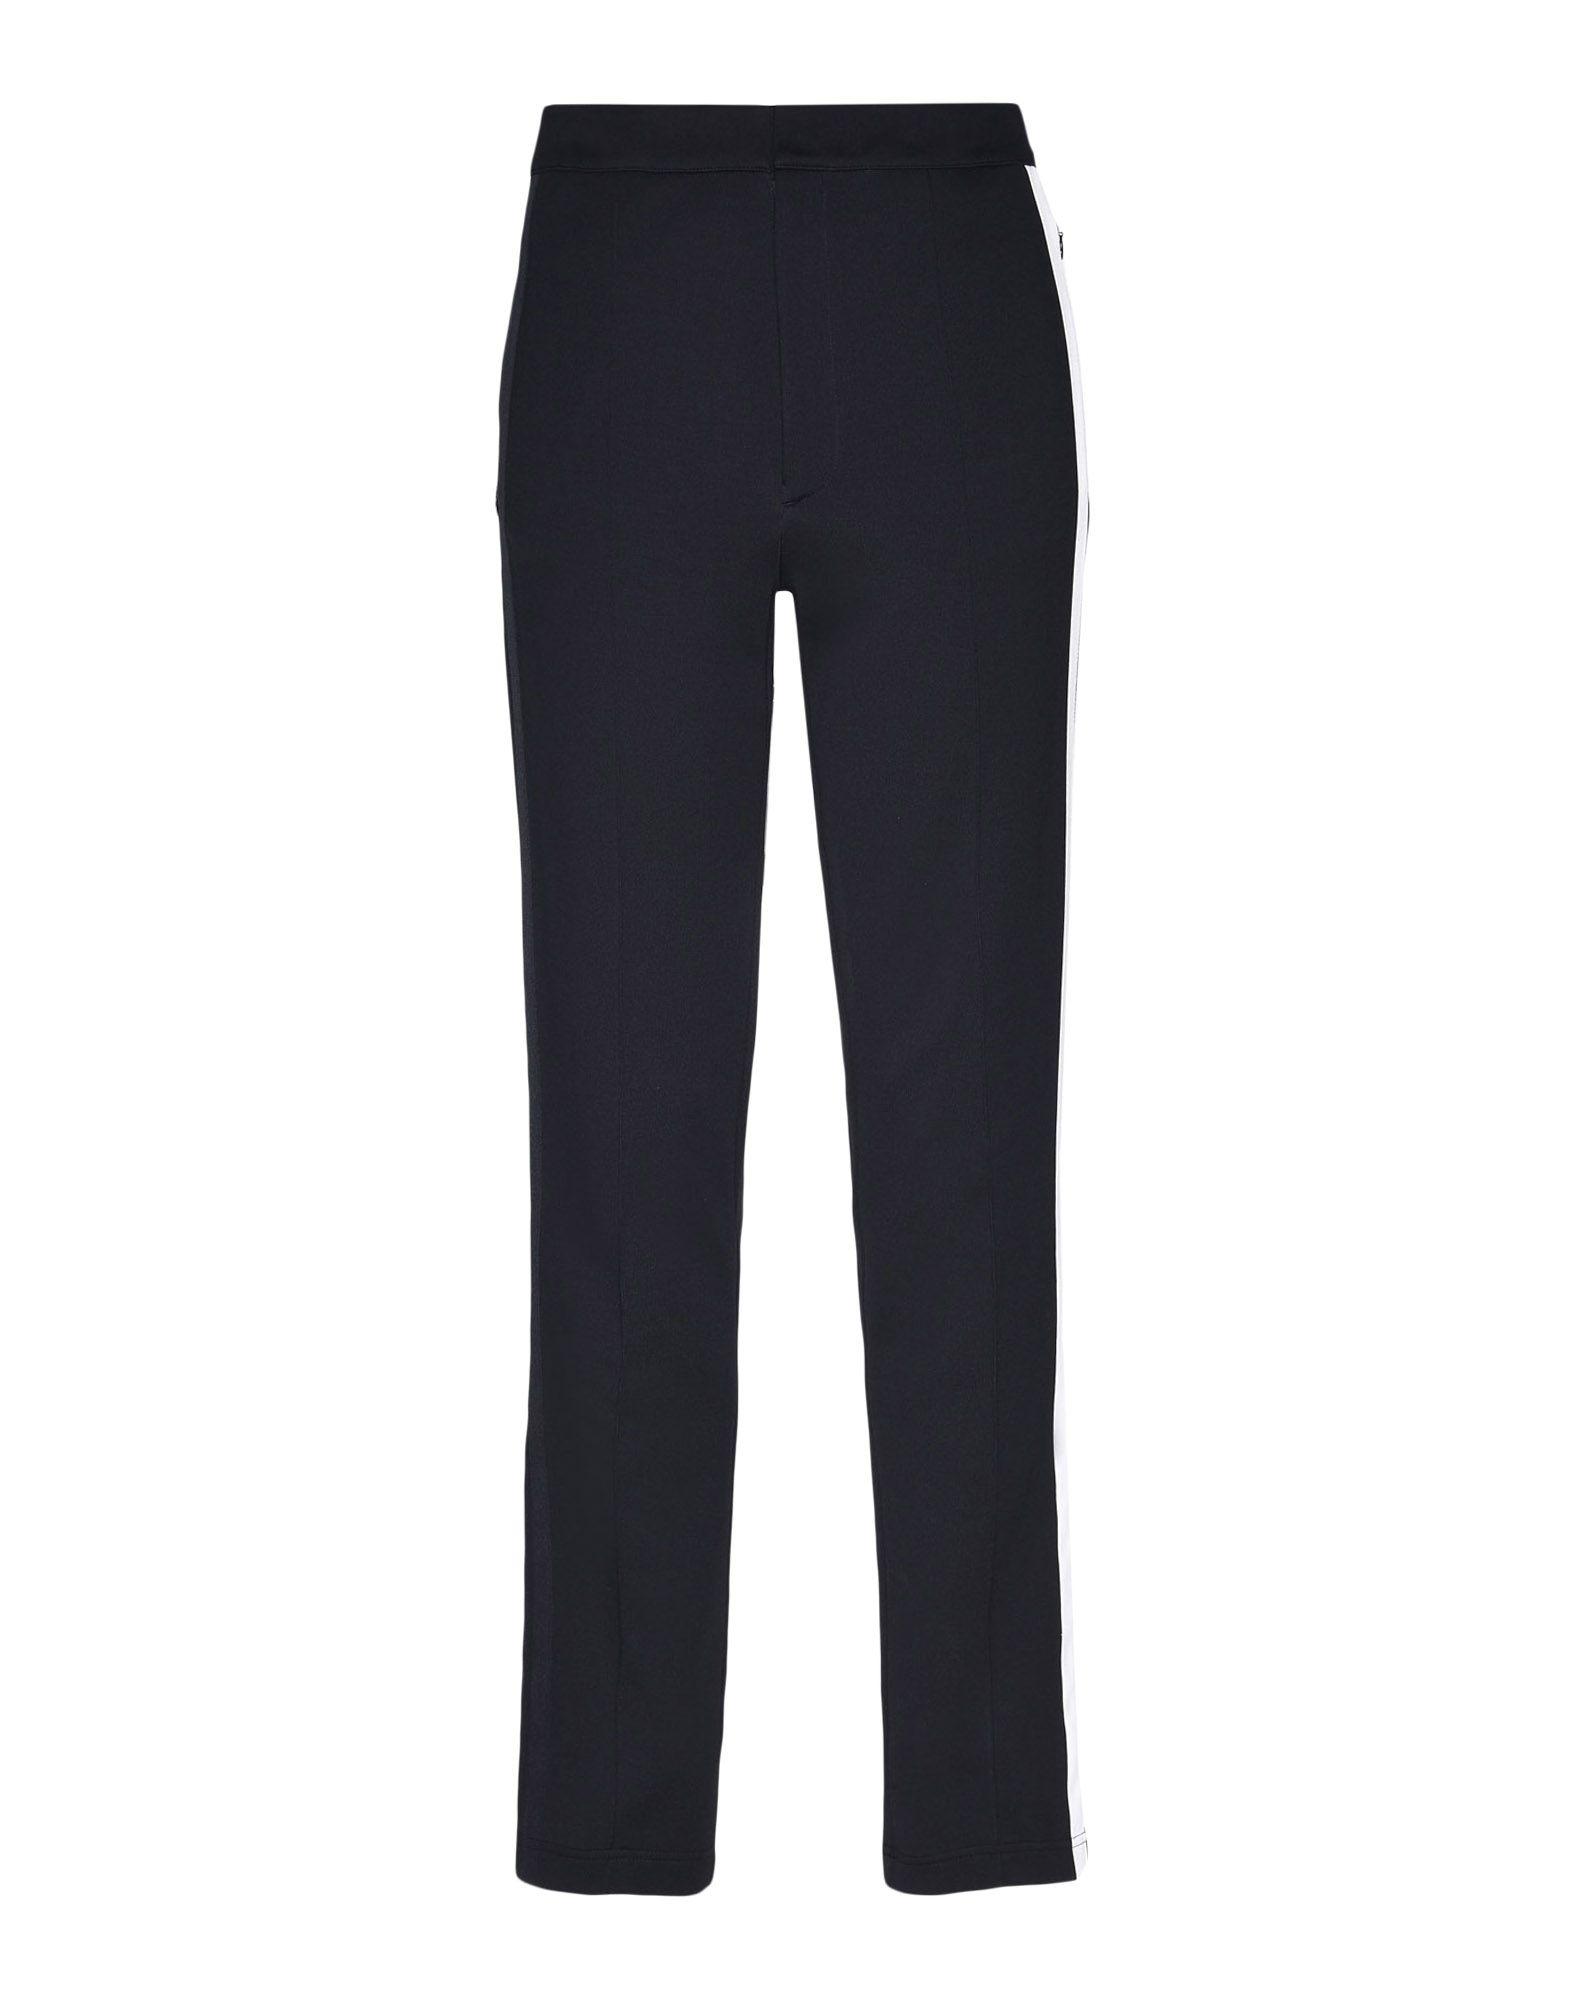 Y-3 Y-3 High Waist Matte Track Pants Casual pants Woman f